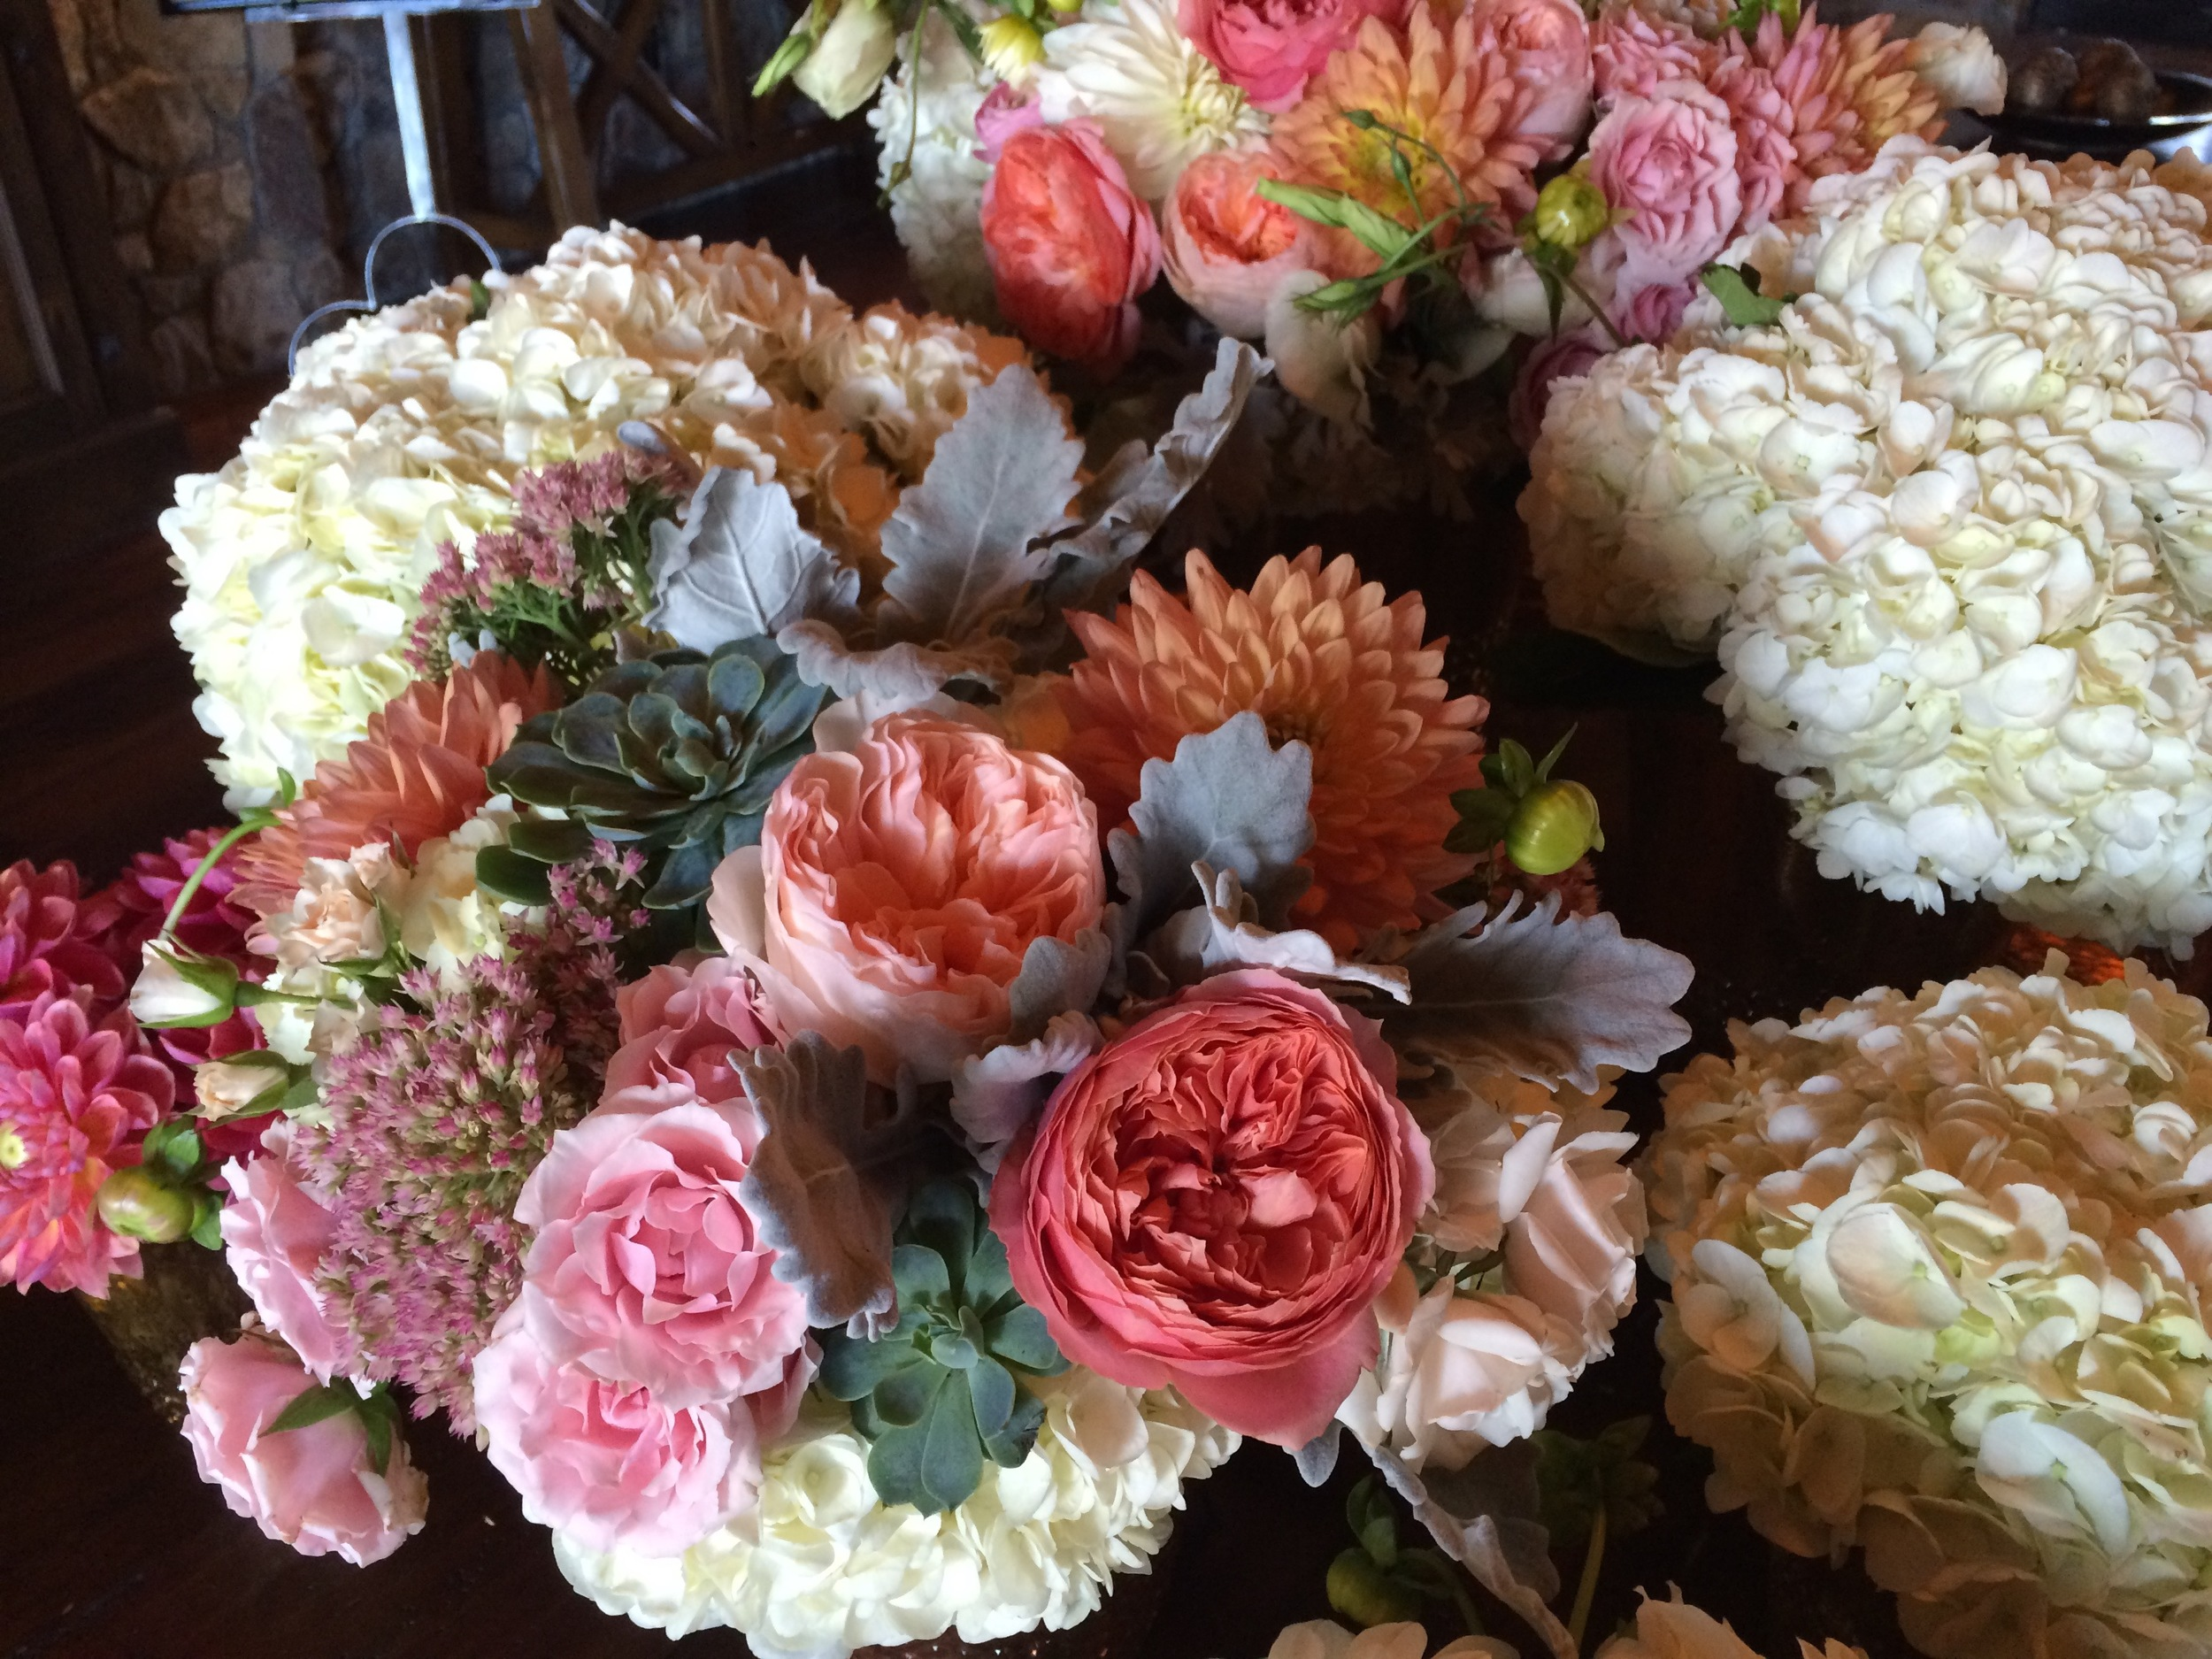 Heirloom Floral Design - Bend Weddings -Farmer florist-Locally grown- Oregon grown-Slow flowers-Flowers to Hold-Brasada Ranch succulents garden roses.jpg